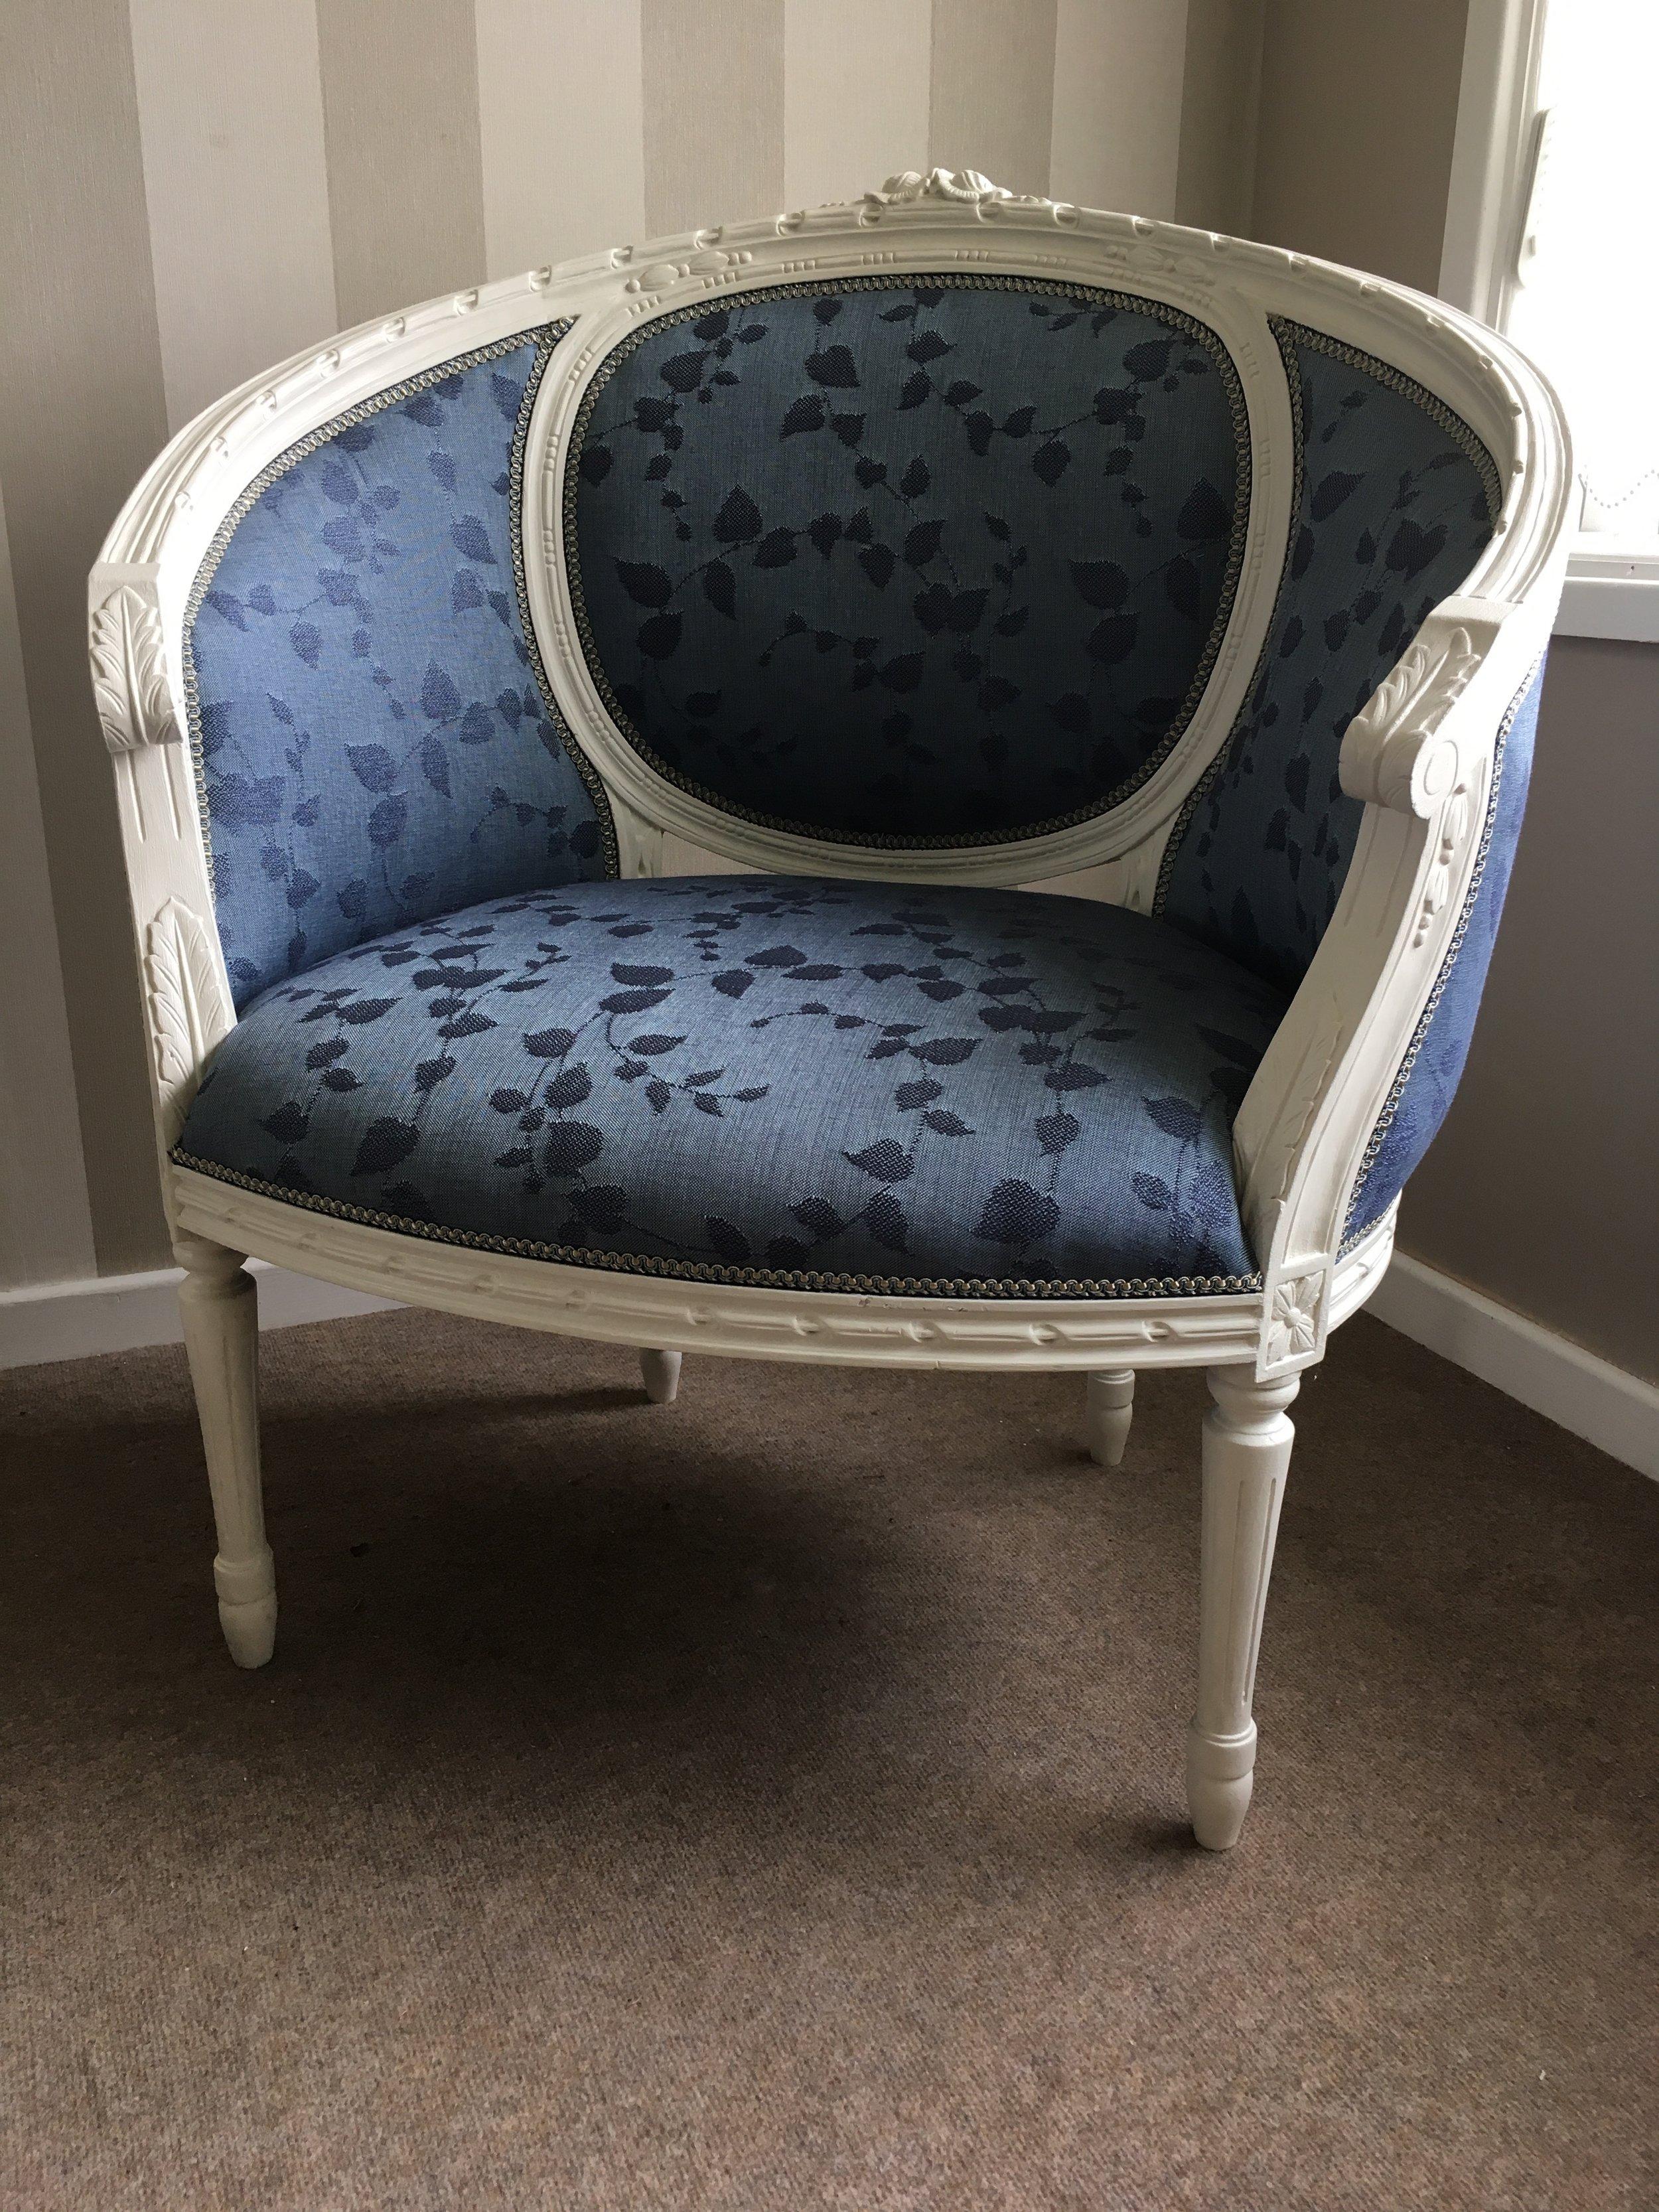 Nursing Chair: £450. One-off item.